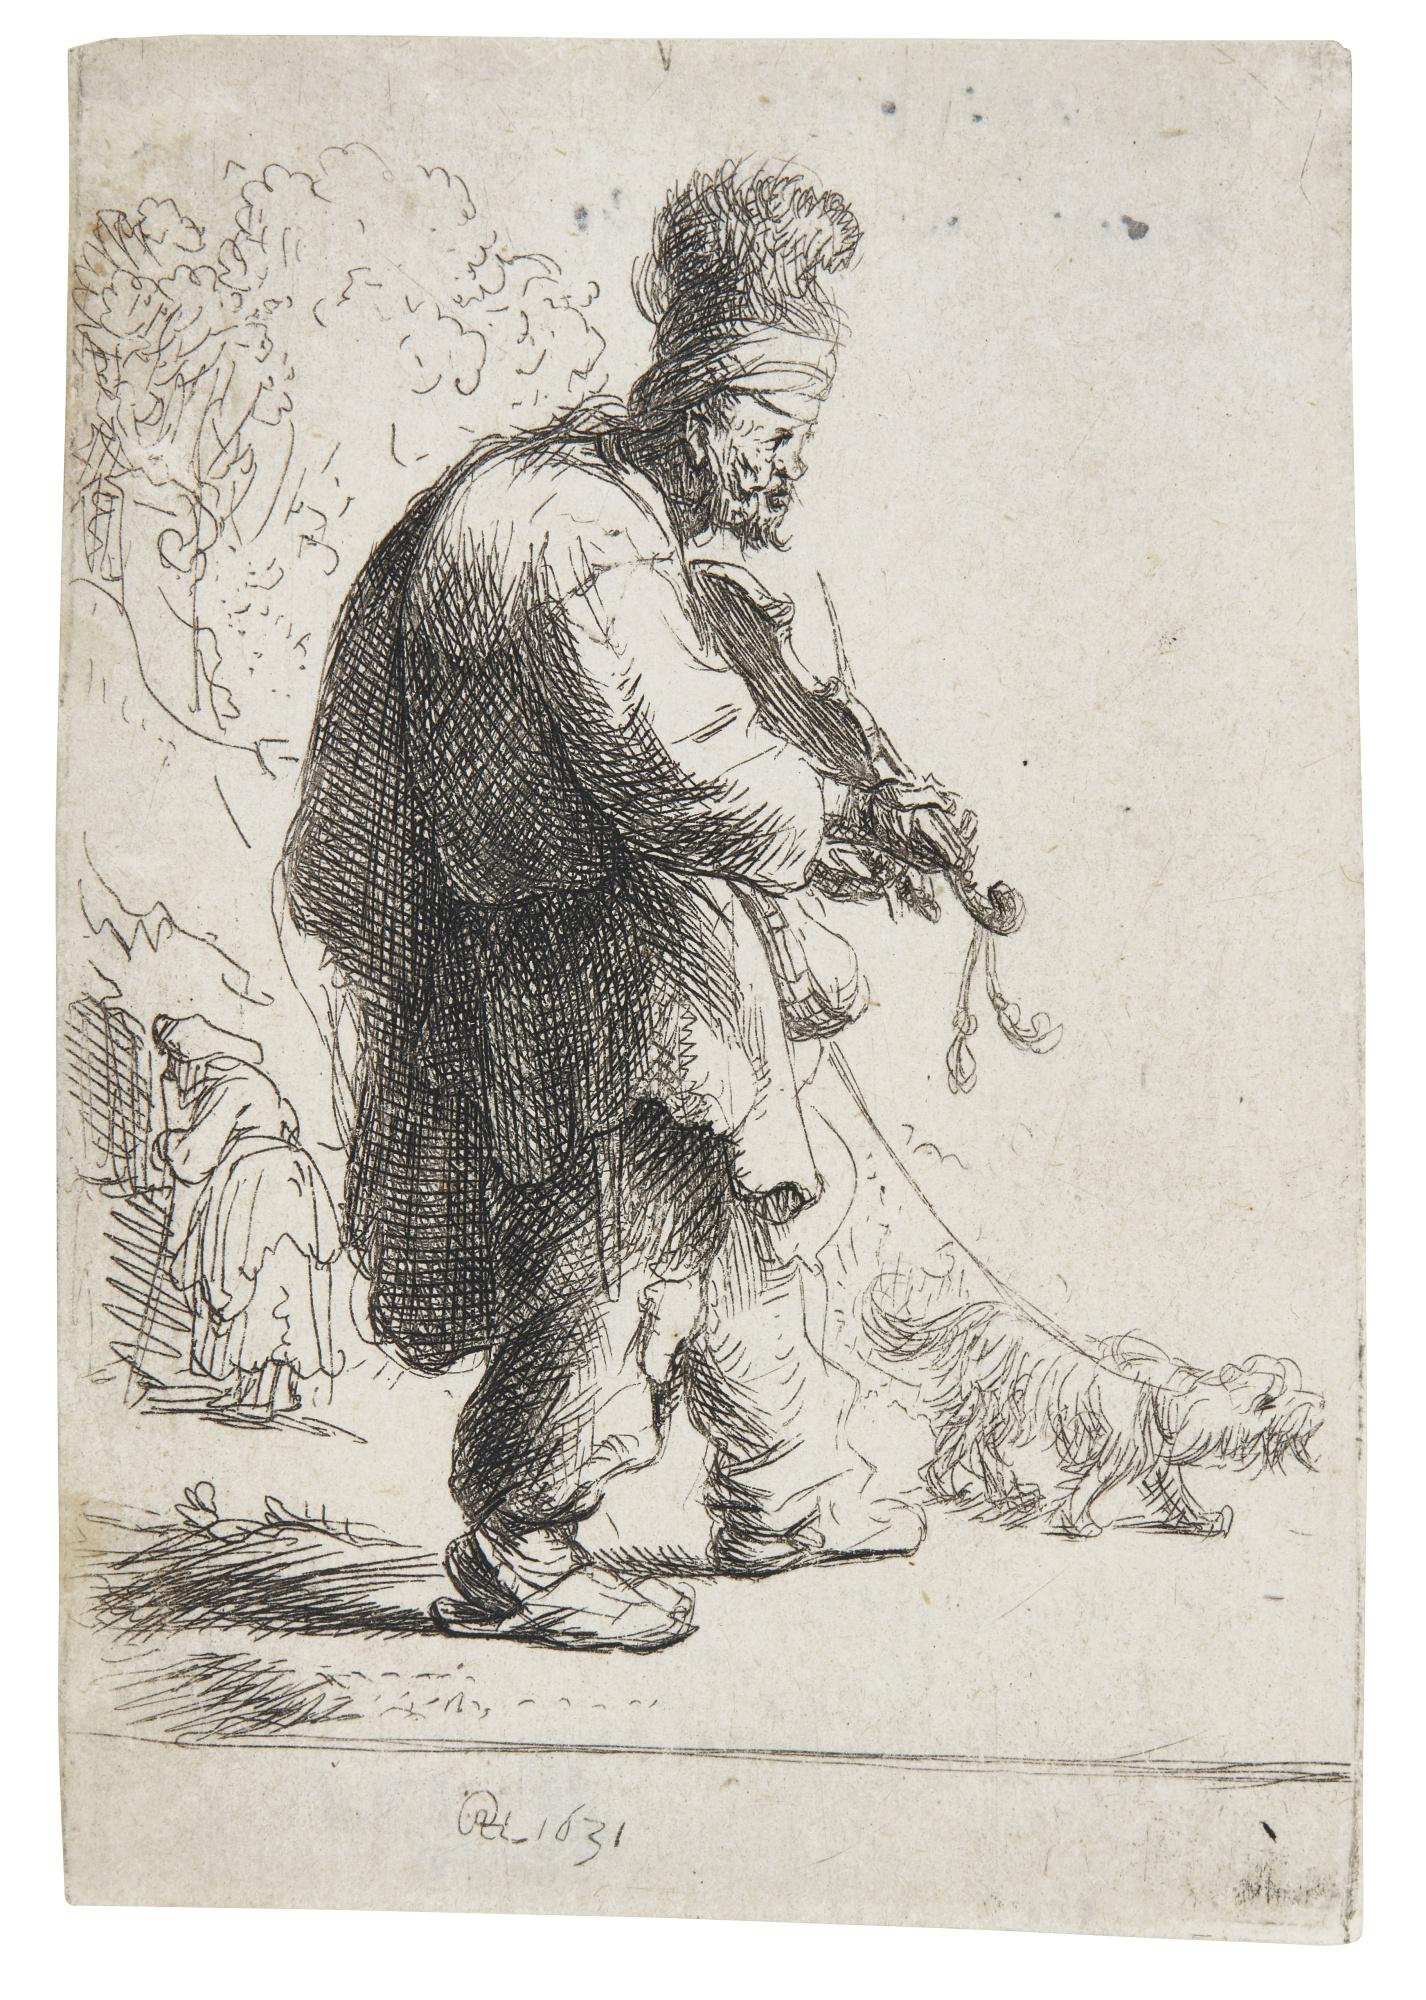 Rembrandt van Rijn-The Blind Fiddler (B. Holl. 138; New Holl. 77; H. 38)-1631